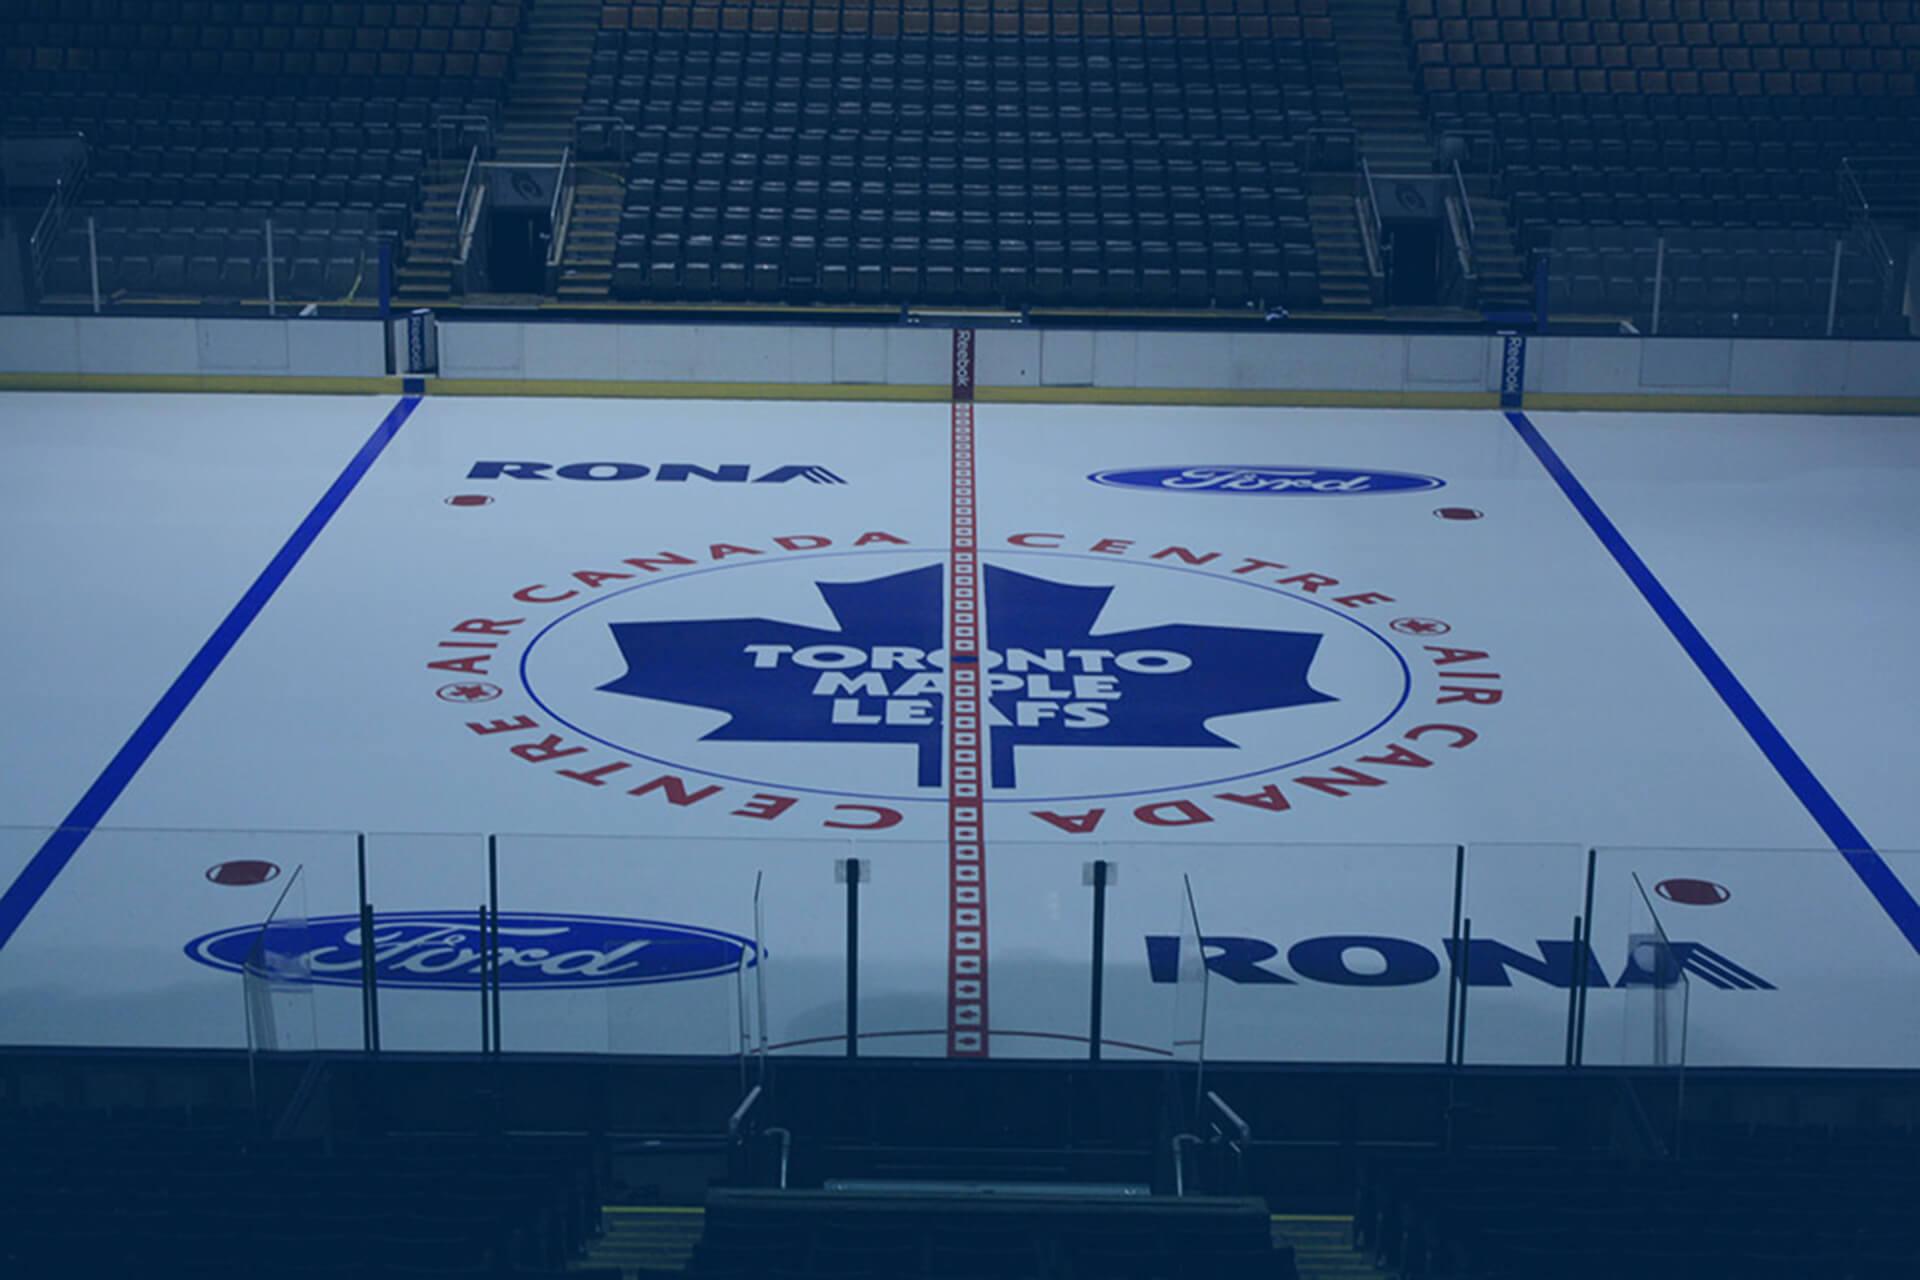 Hockey Arena Toronto